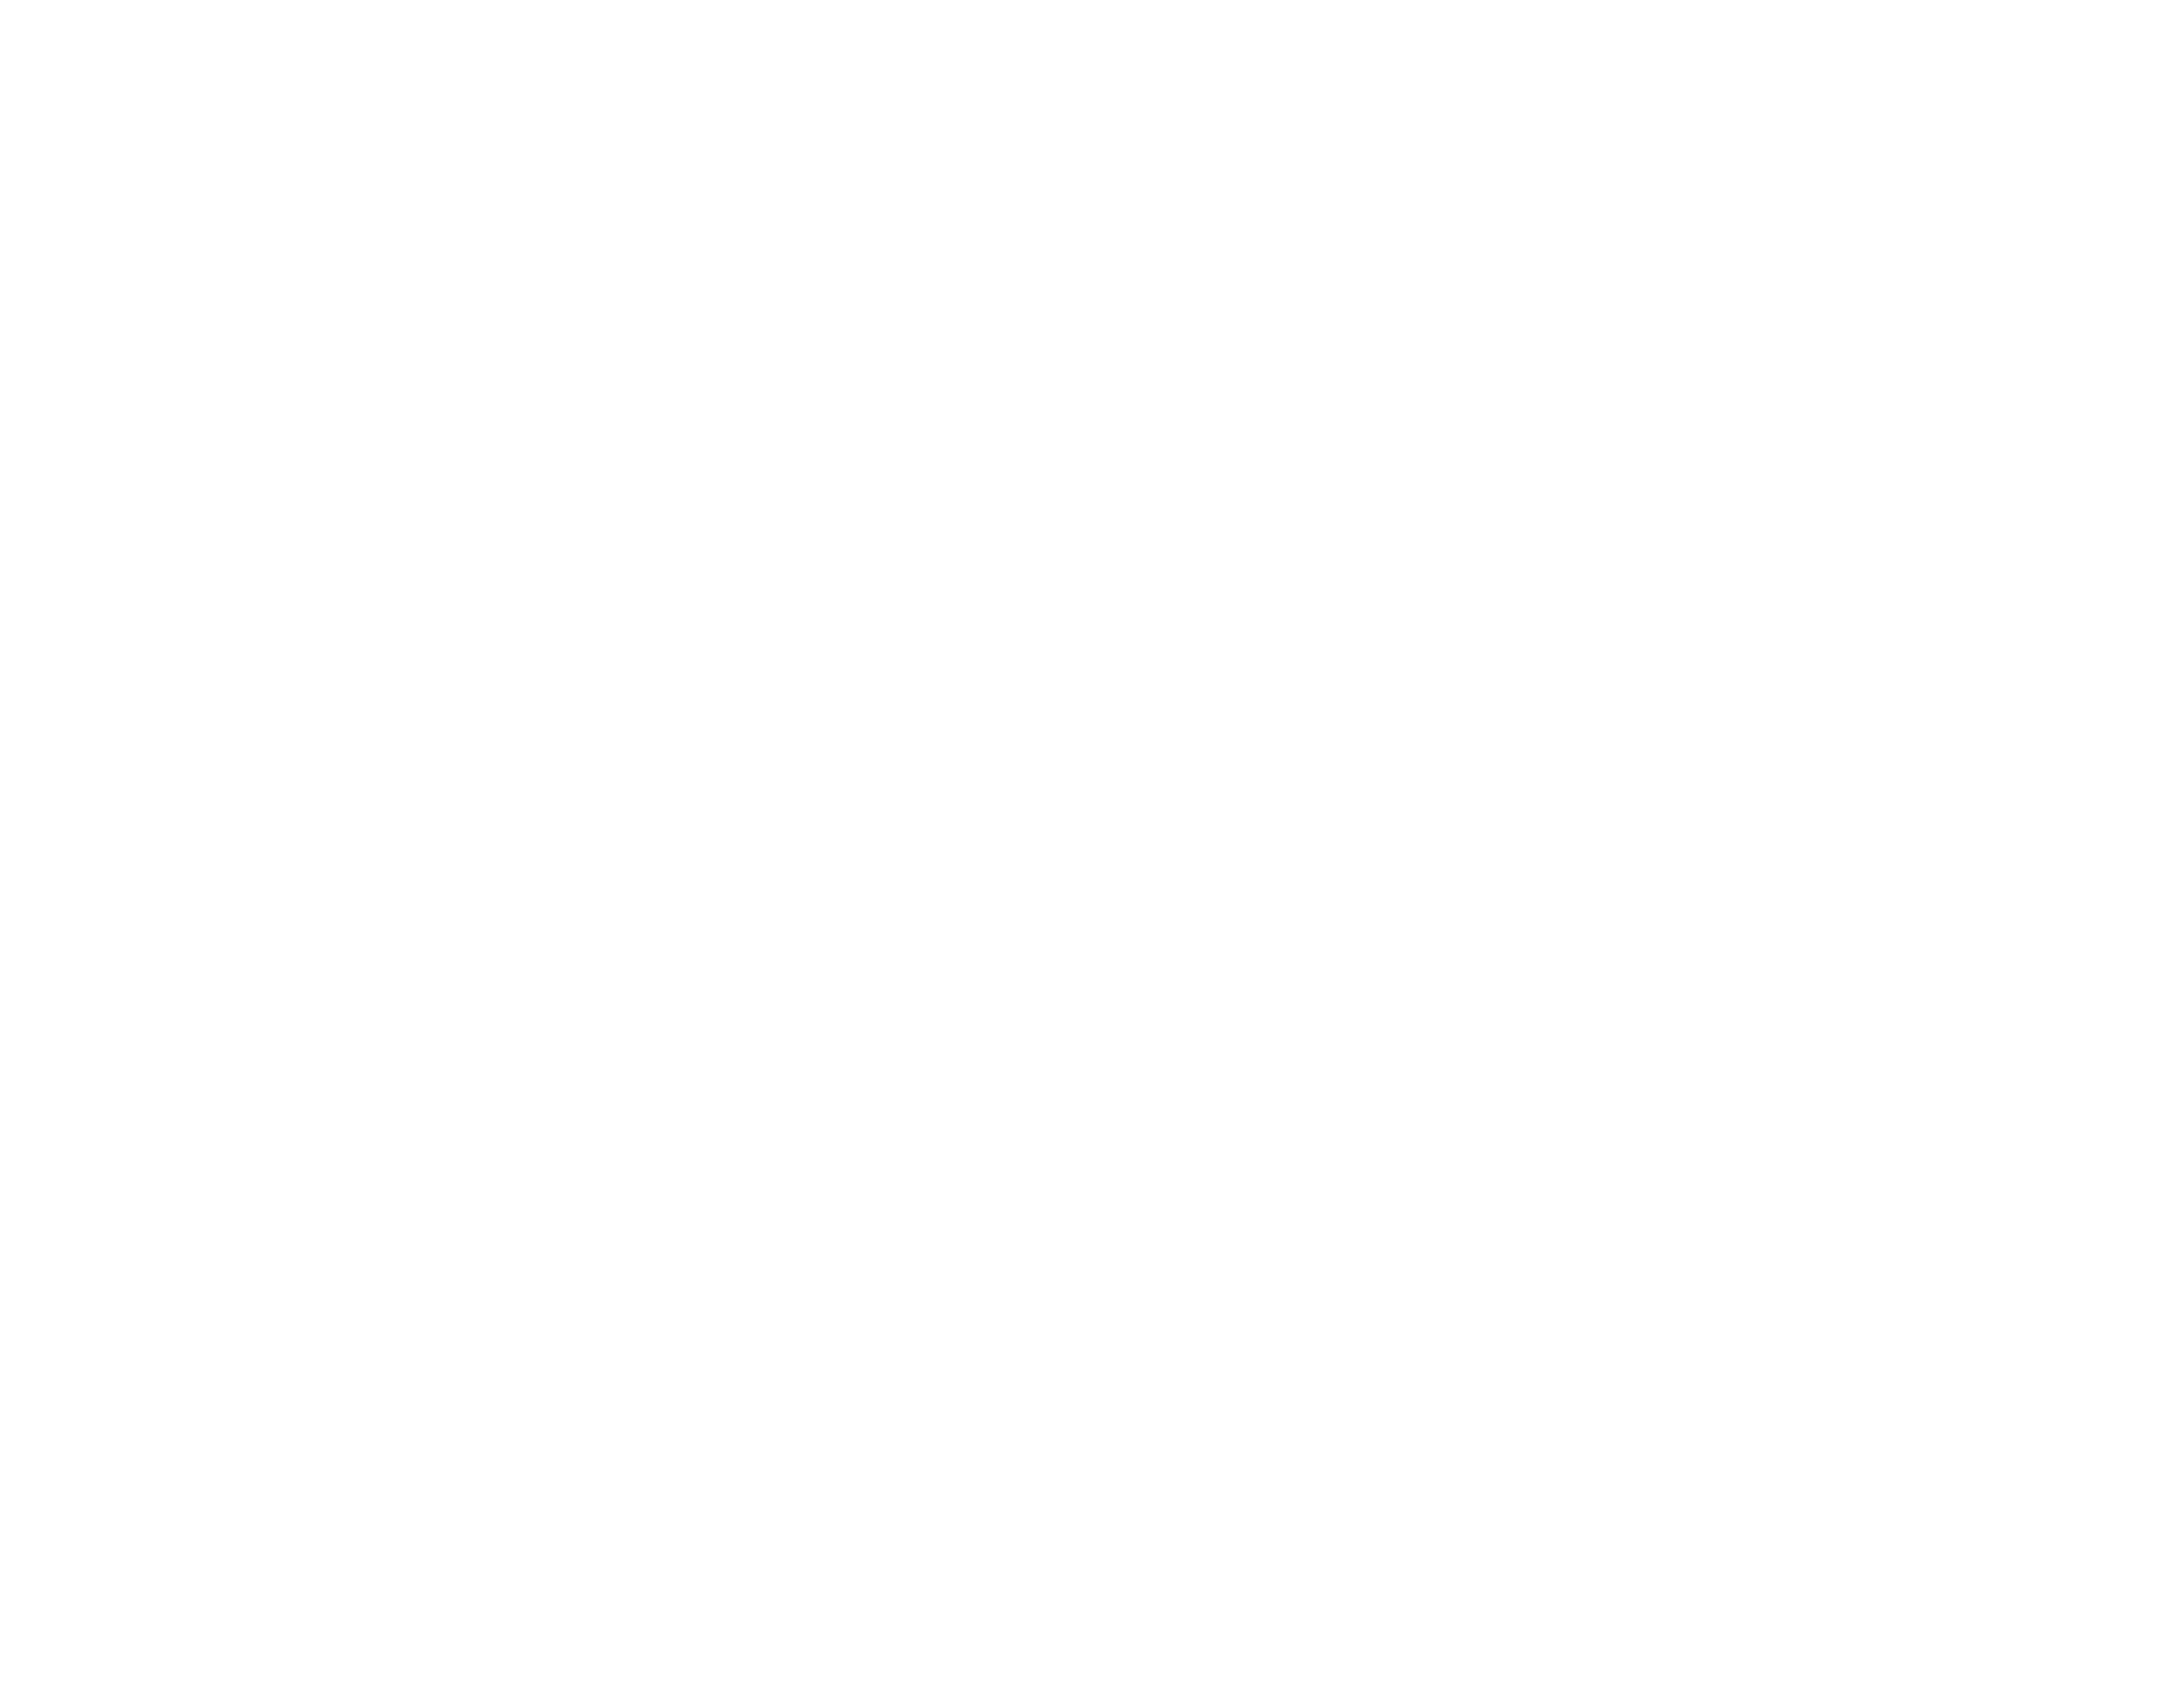 ESBD-Vereinsliga